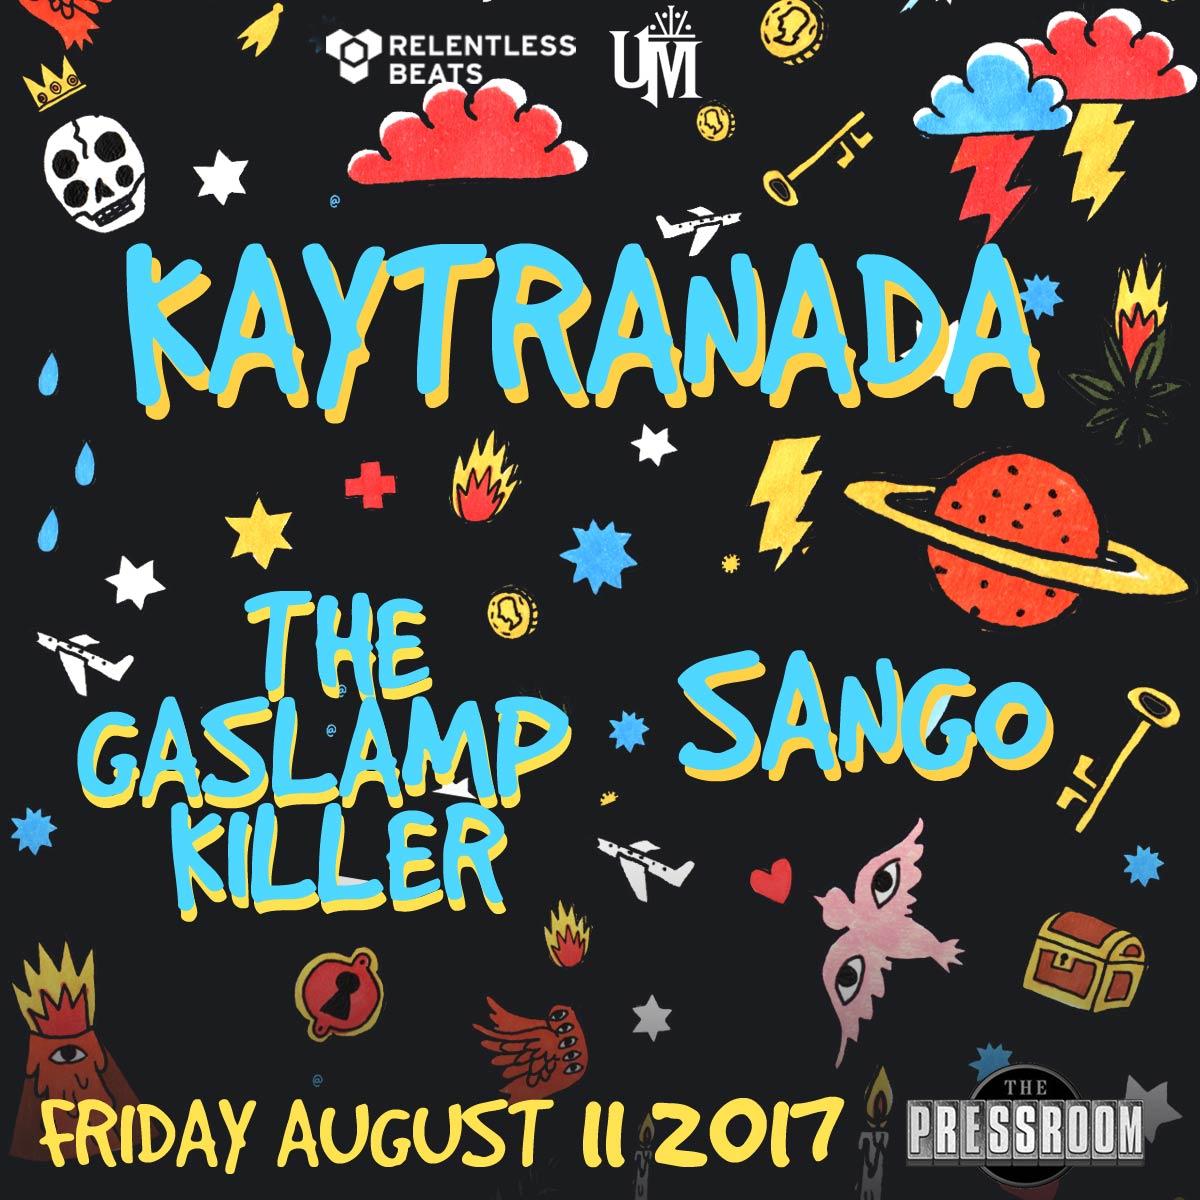 Flyer for Kaytranada + The Gaslamp Killer + Sango